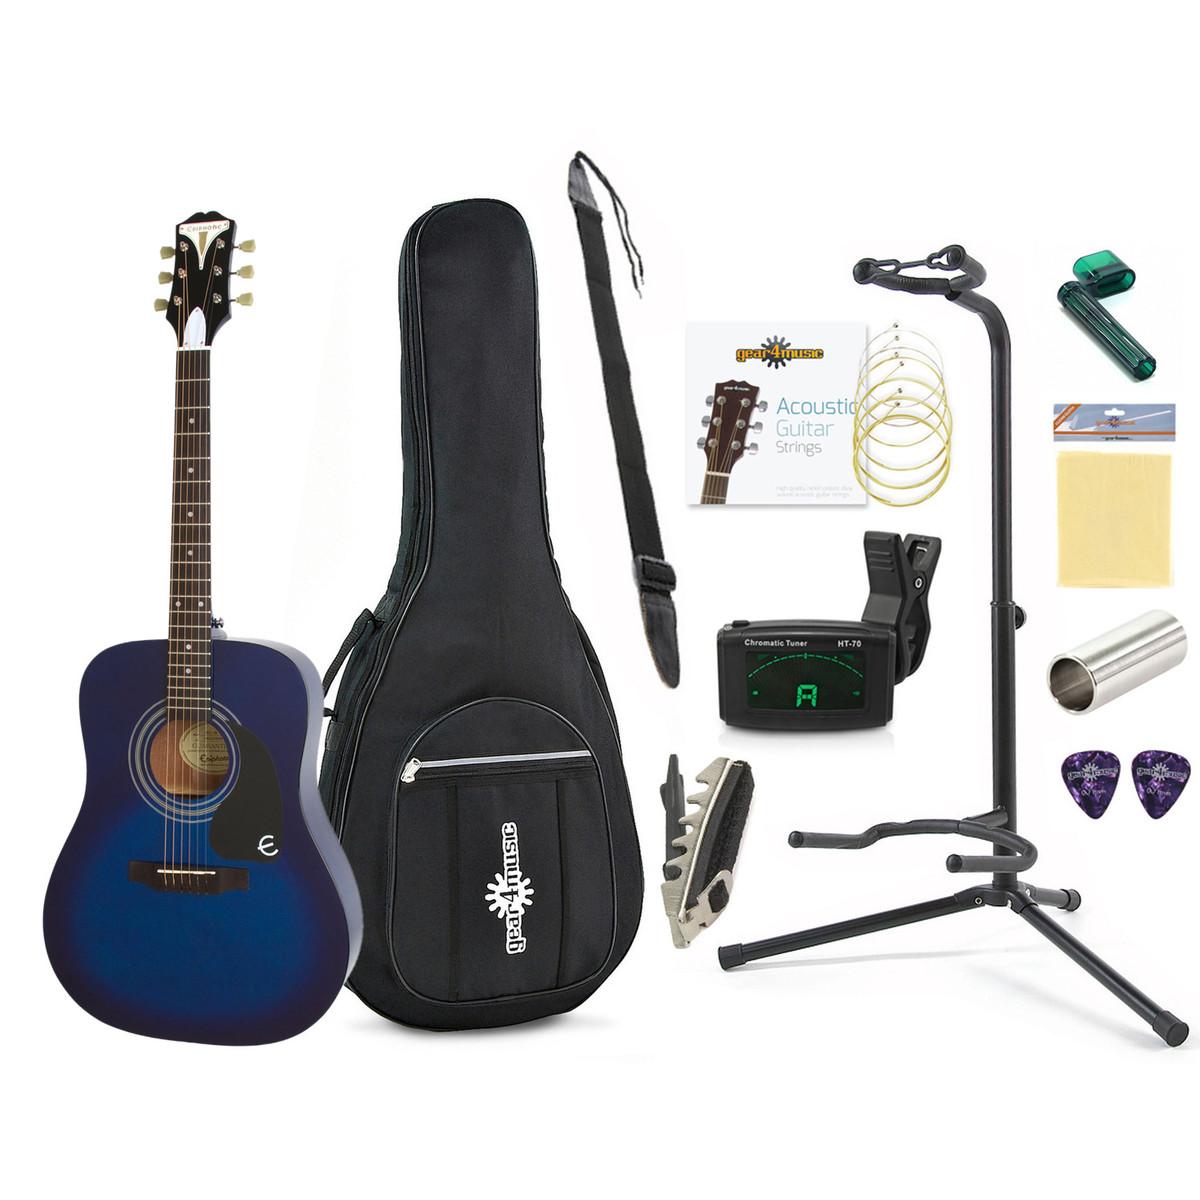 Epiphone Pro 1 Beginners Guitar Pack Blue At Gear4music Com